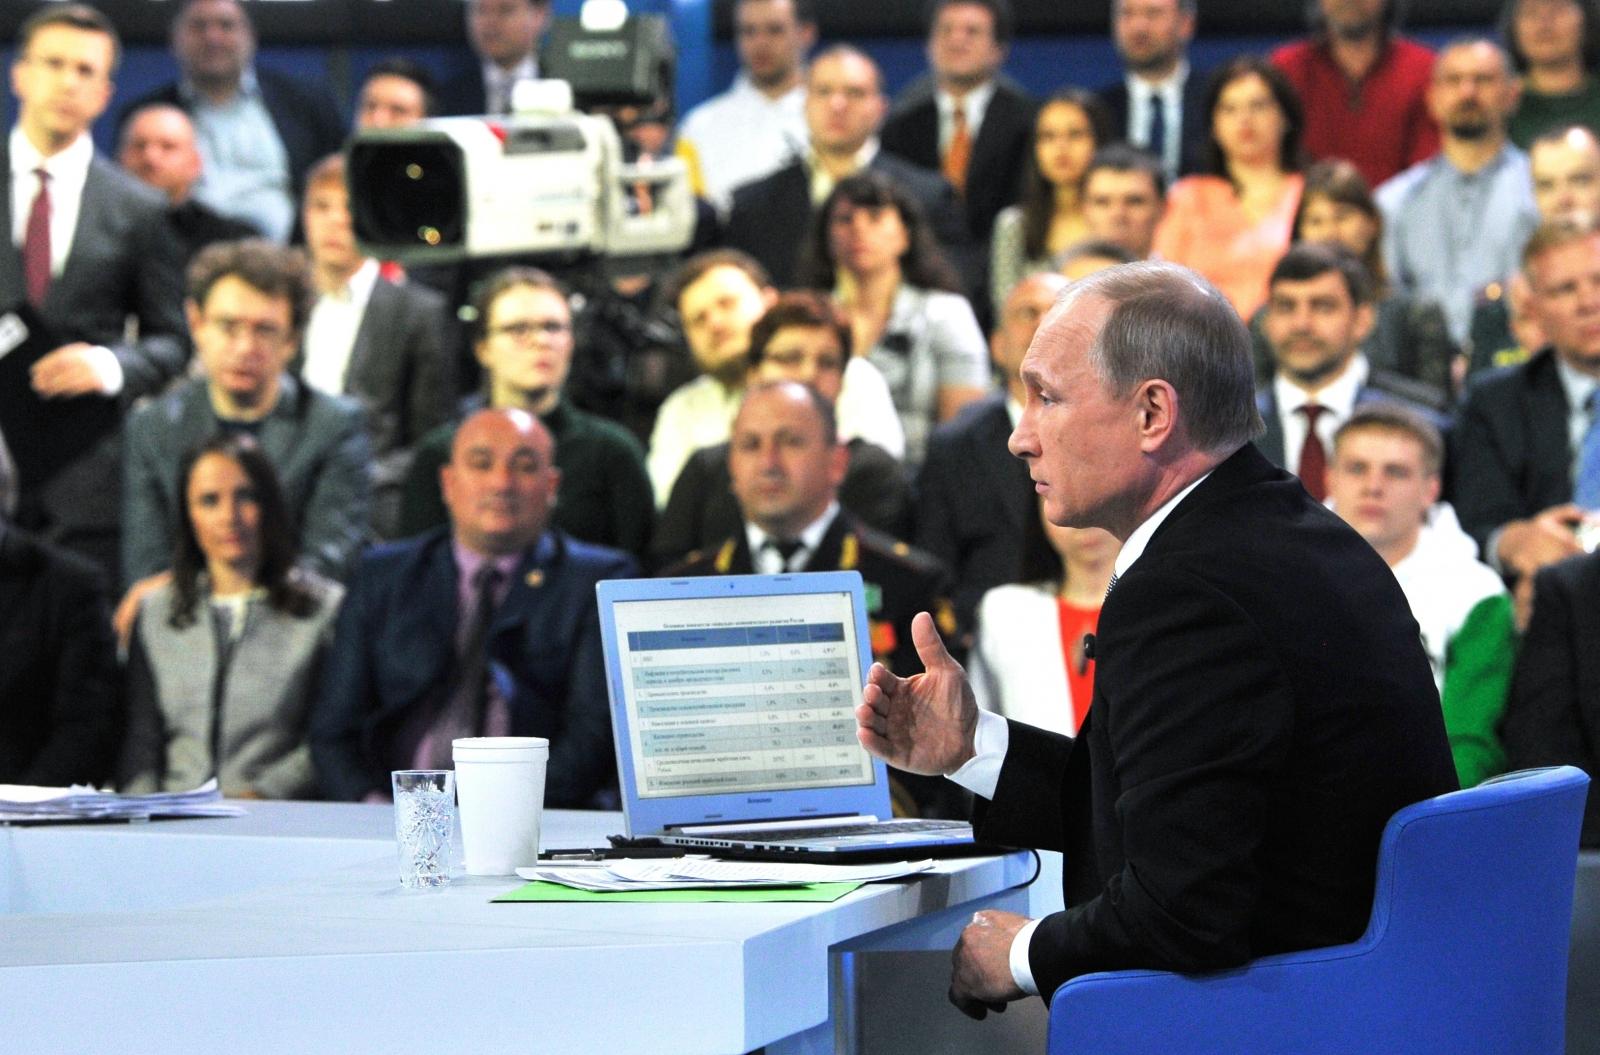 Putin live Q&A